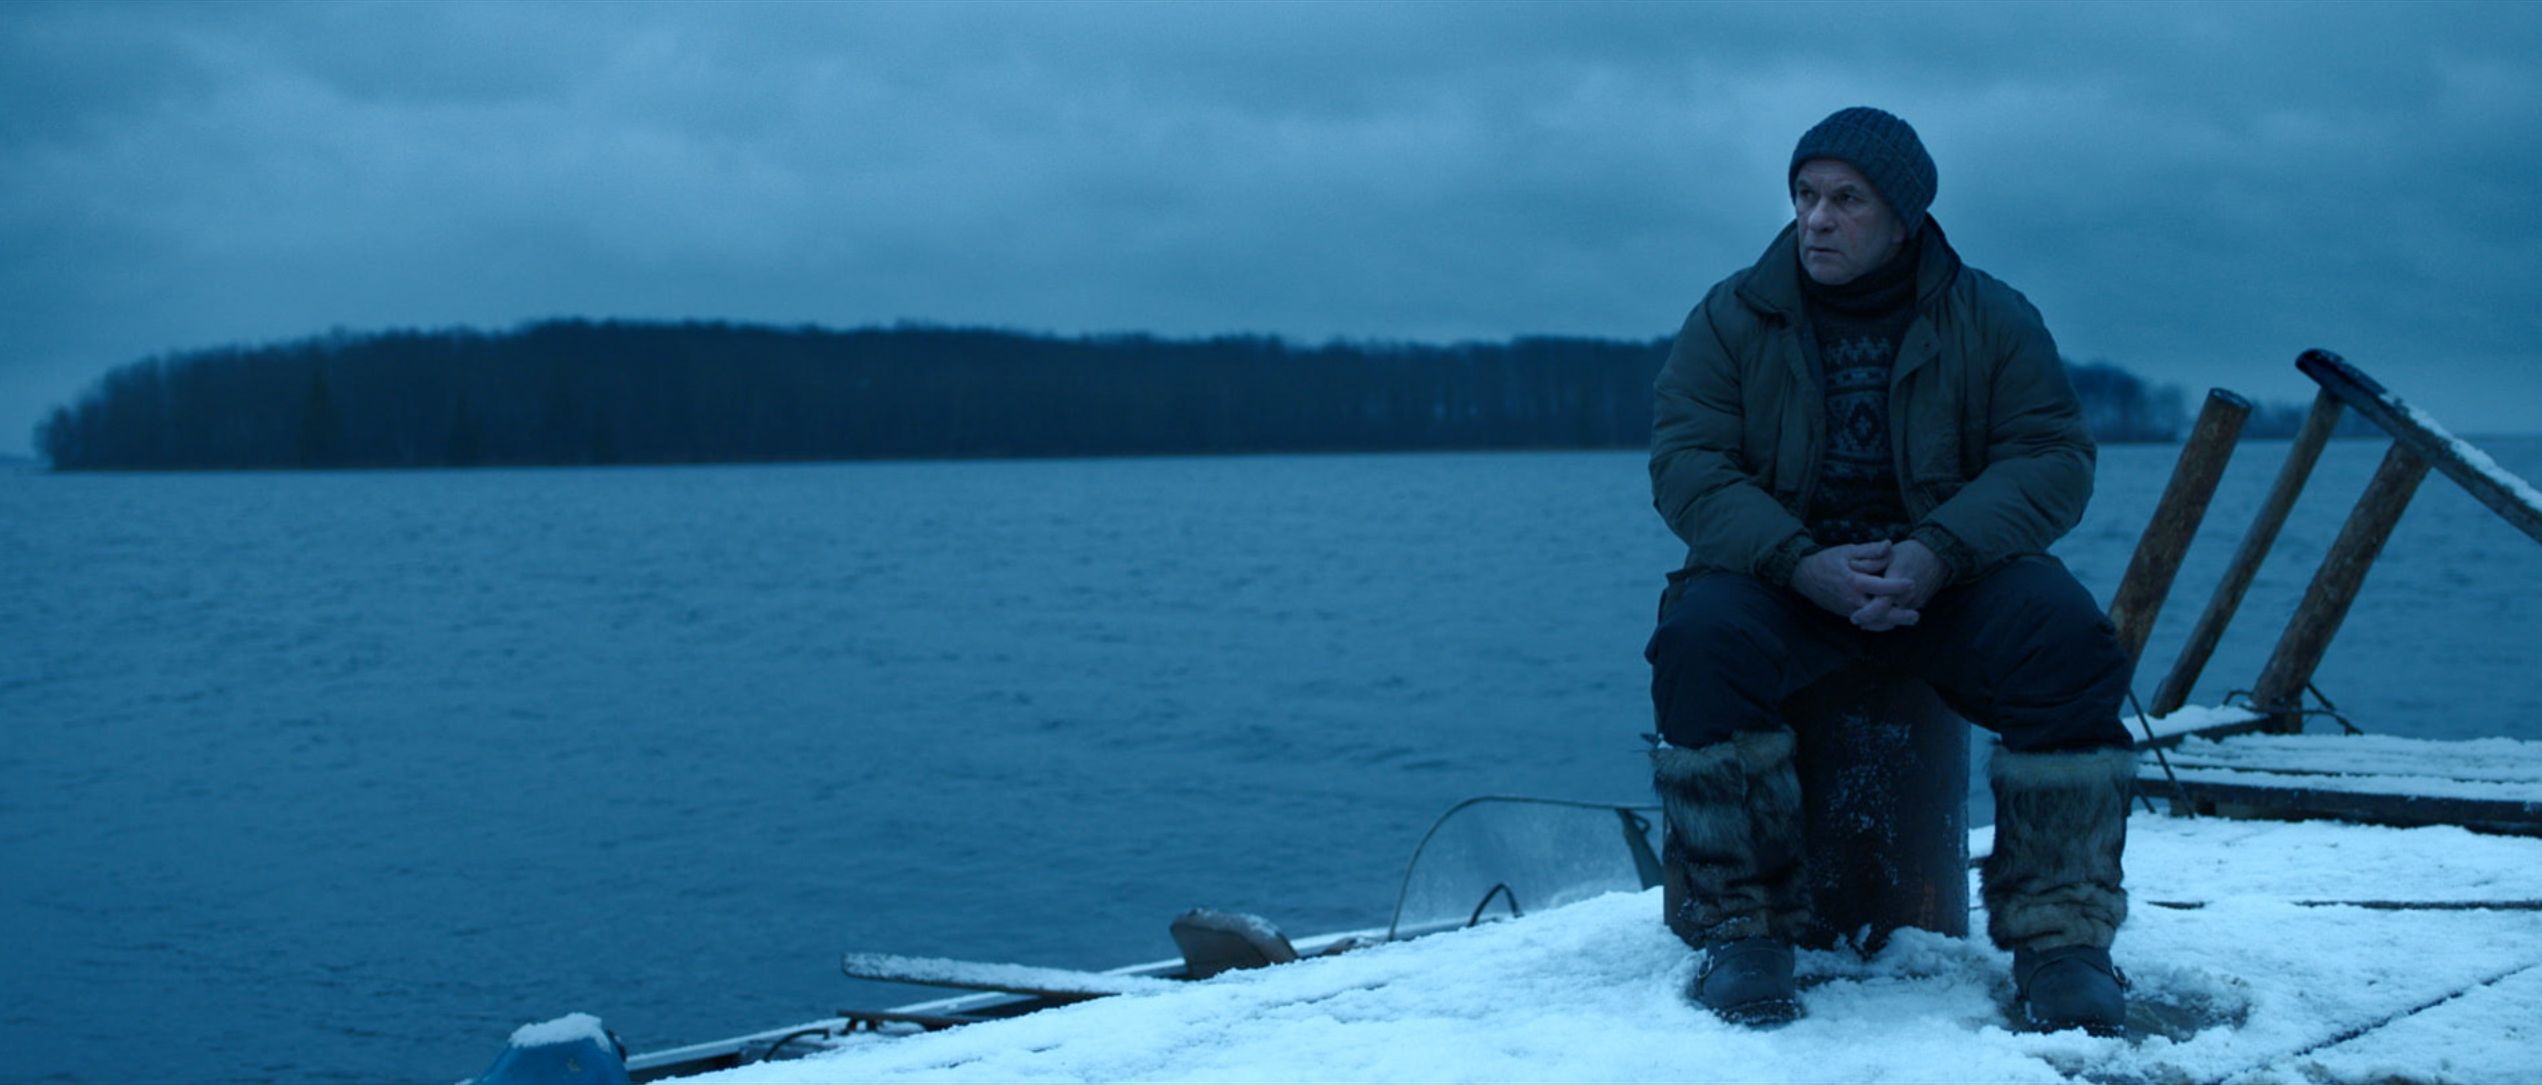 Alexey Guskov in Karelia